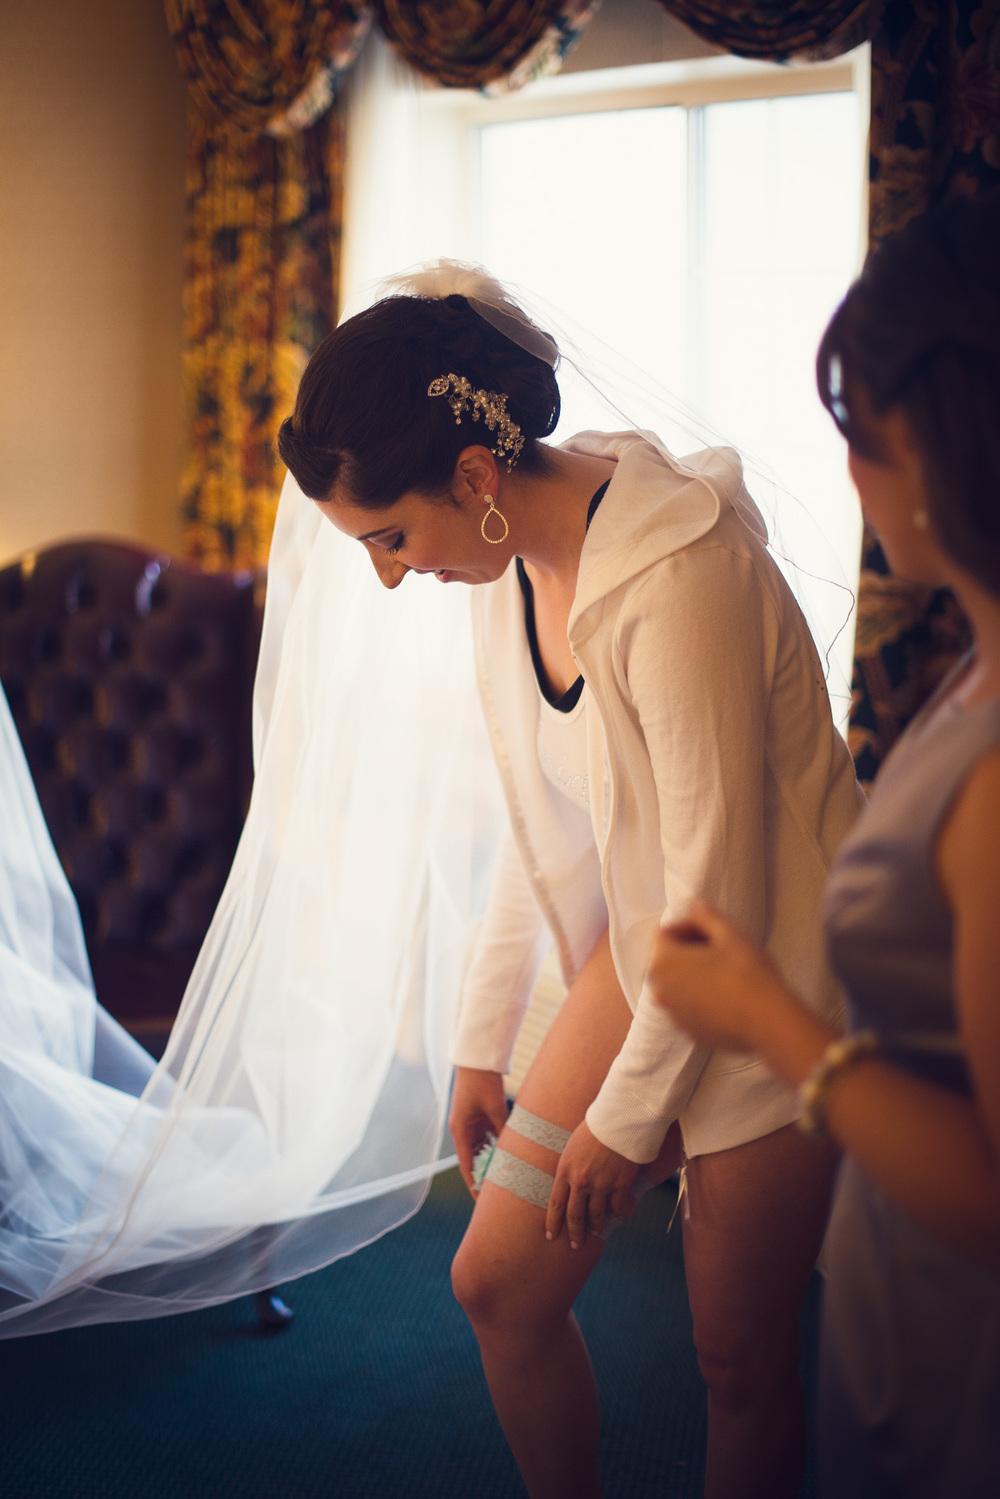 bride garter leg smiling getting ready